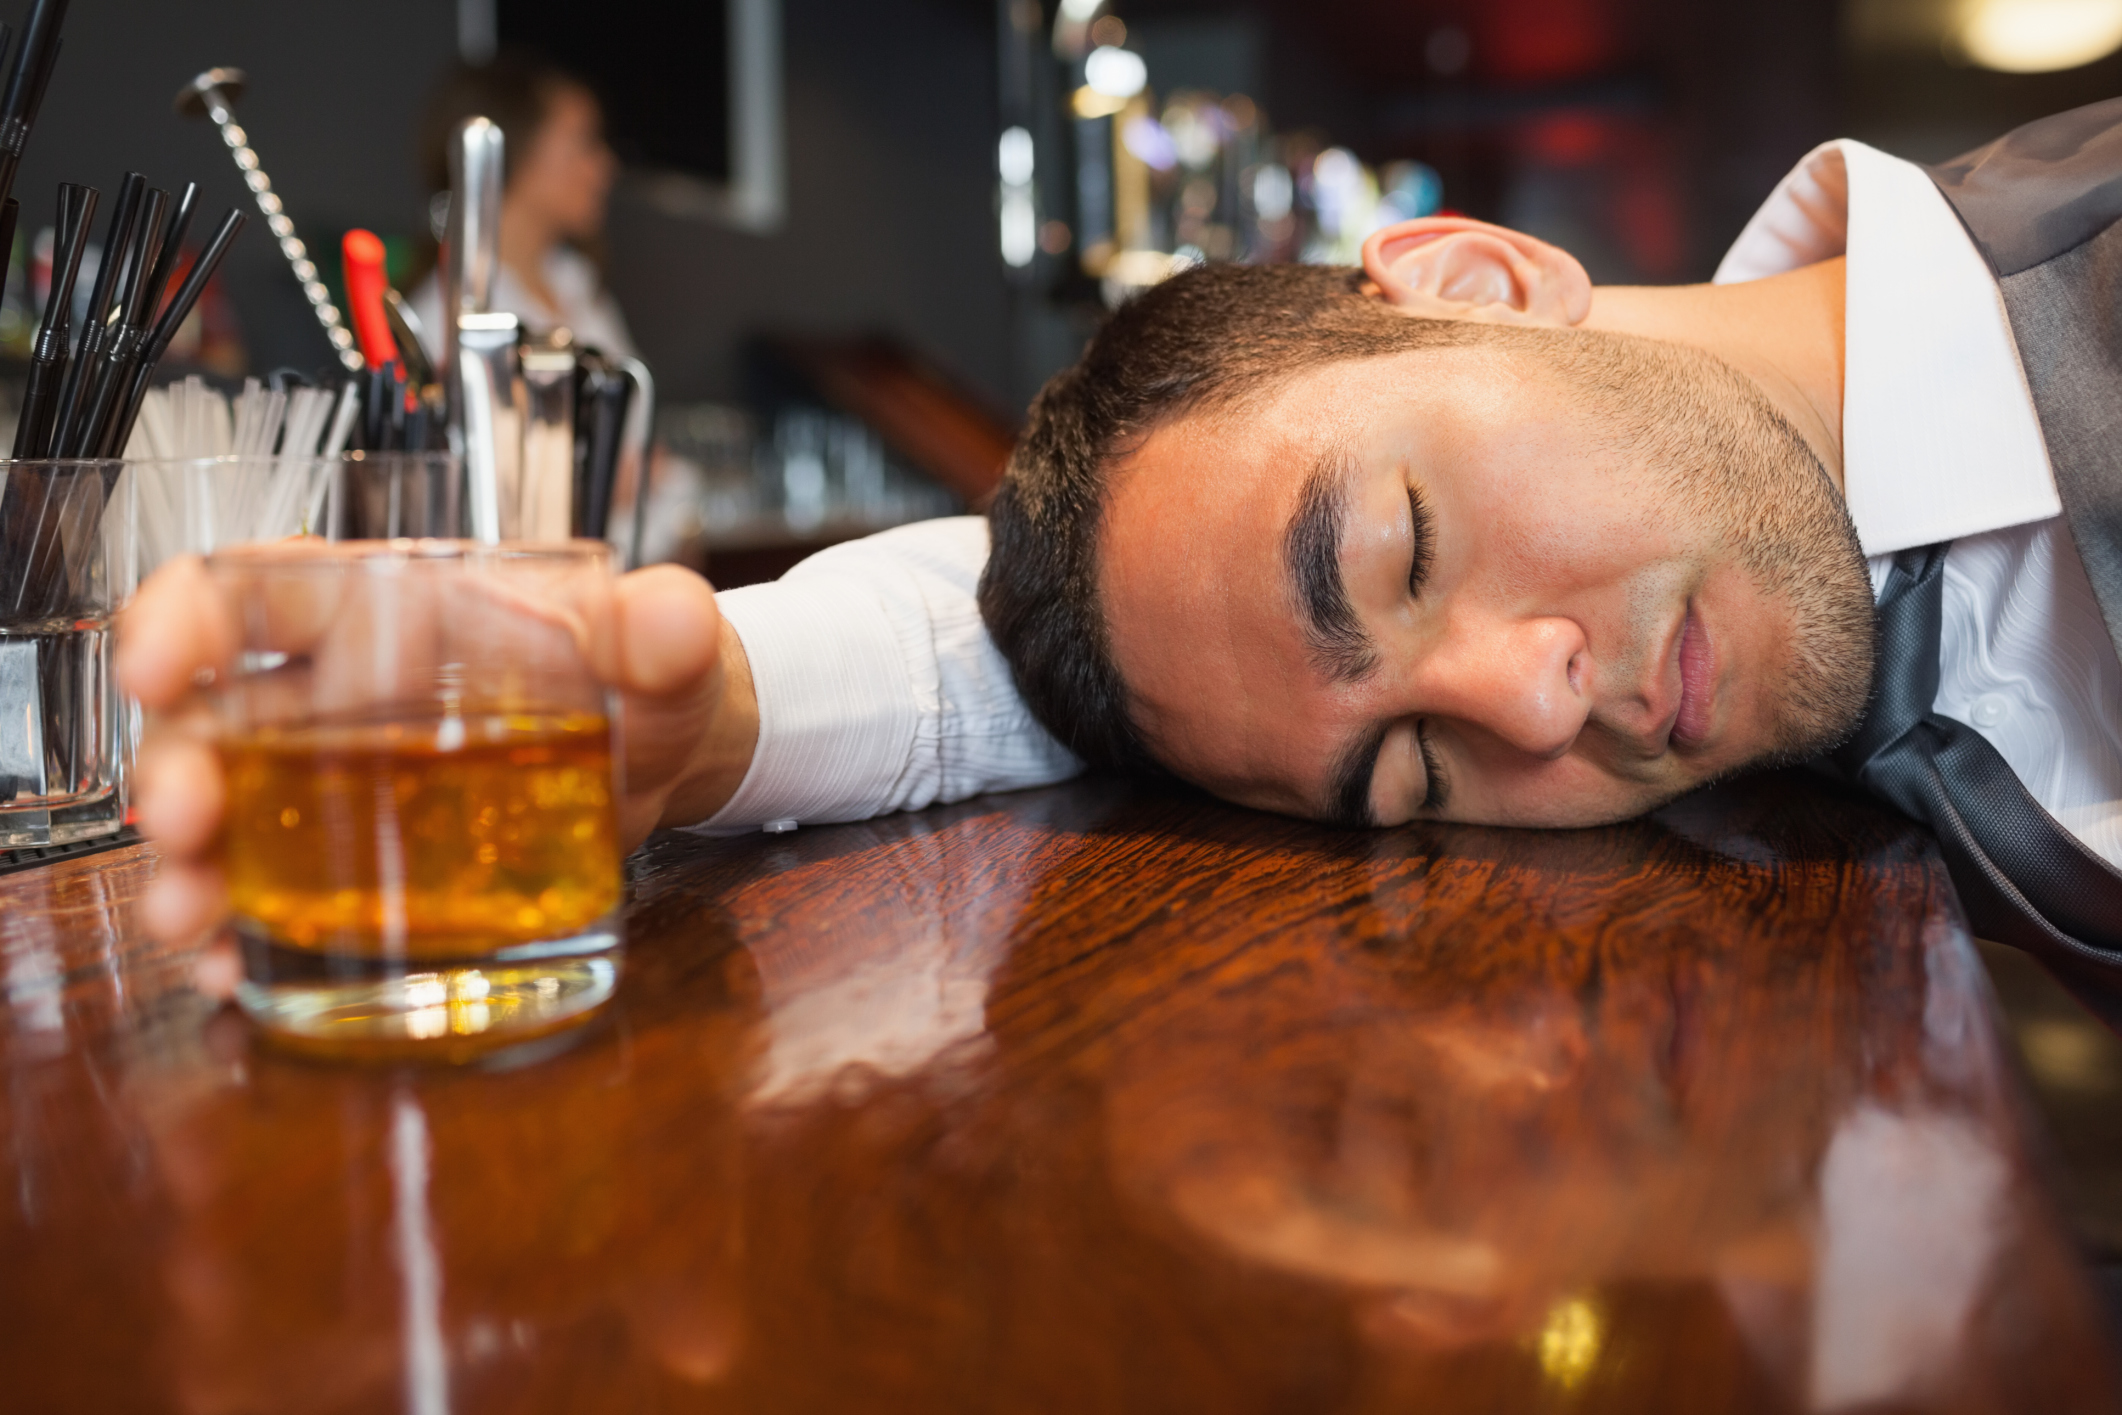 Drunk pics images 81